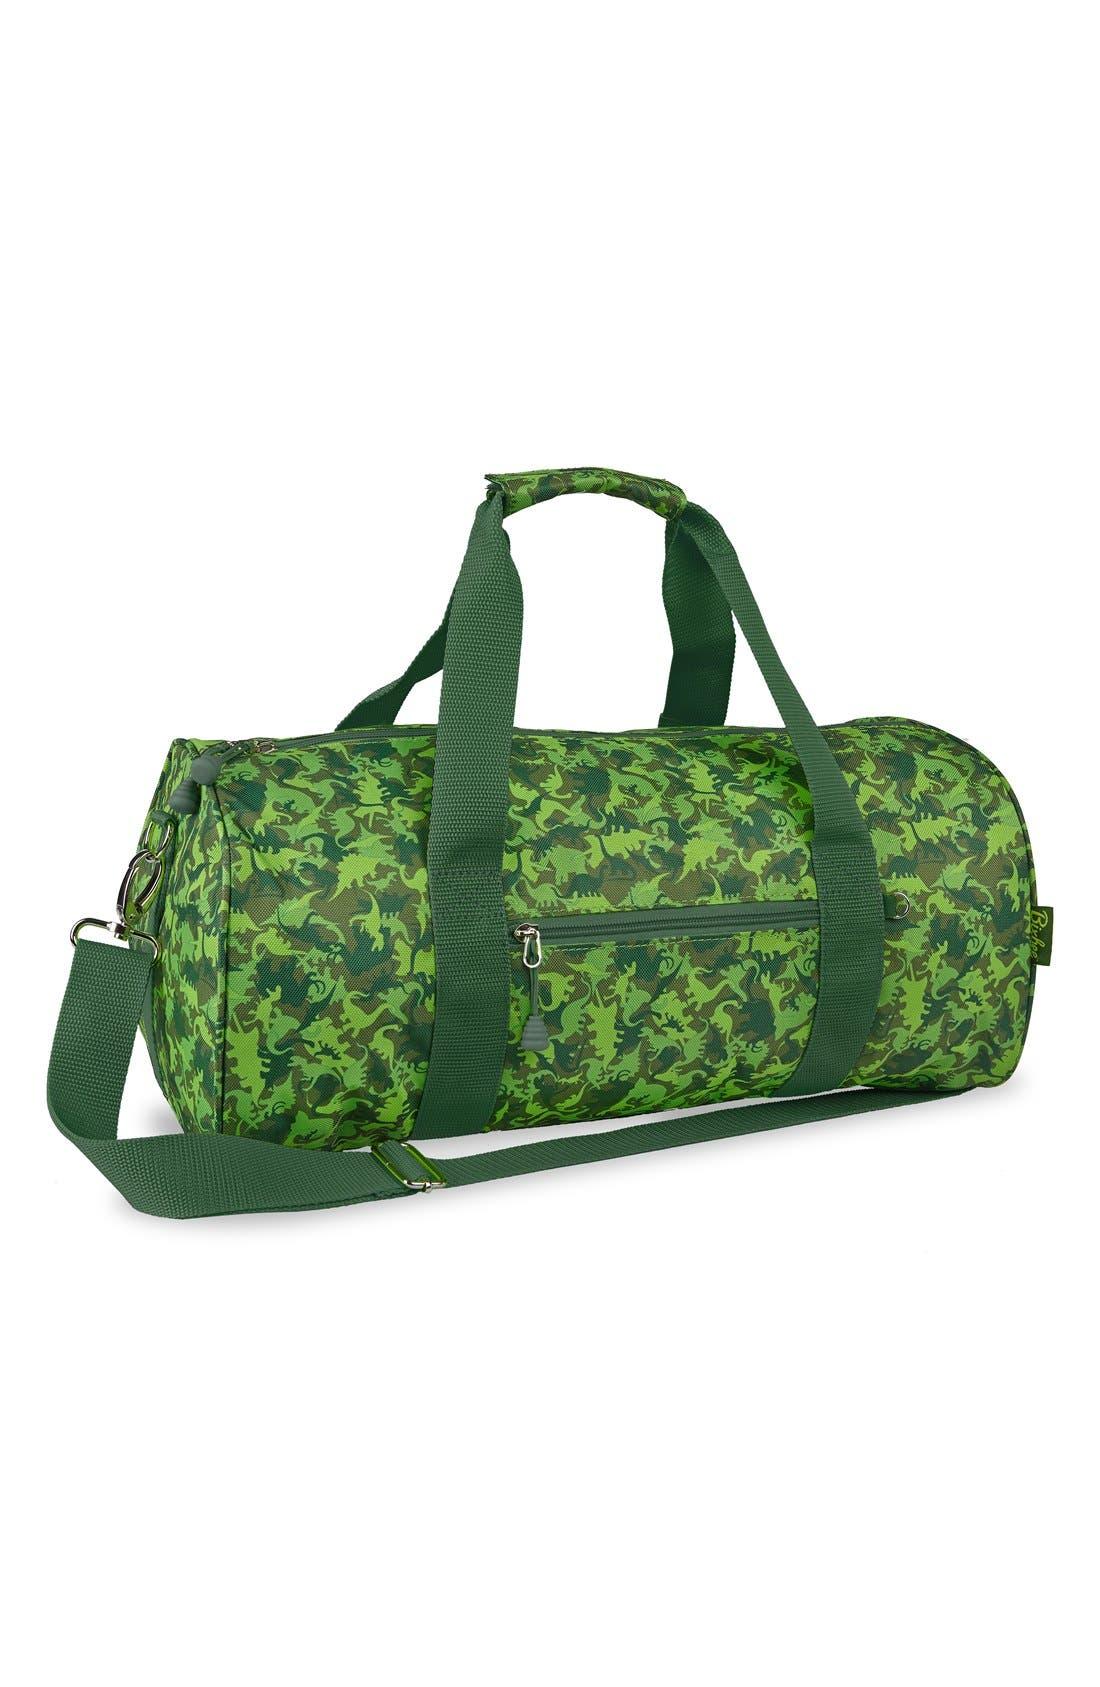 Main Image - Bixbee 'Large Dino Camo' Sports Duffel Bag (Boys)